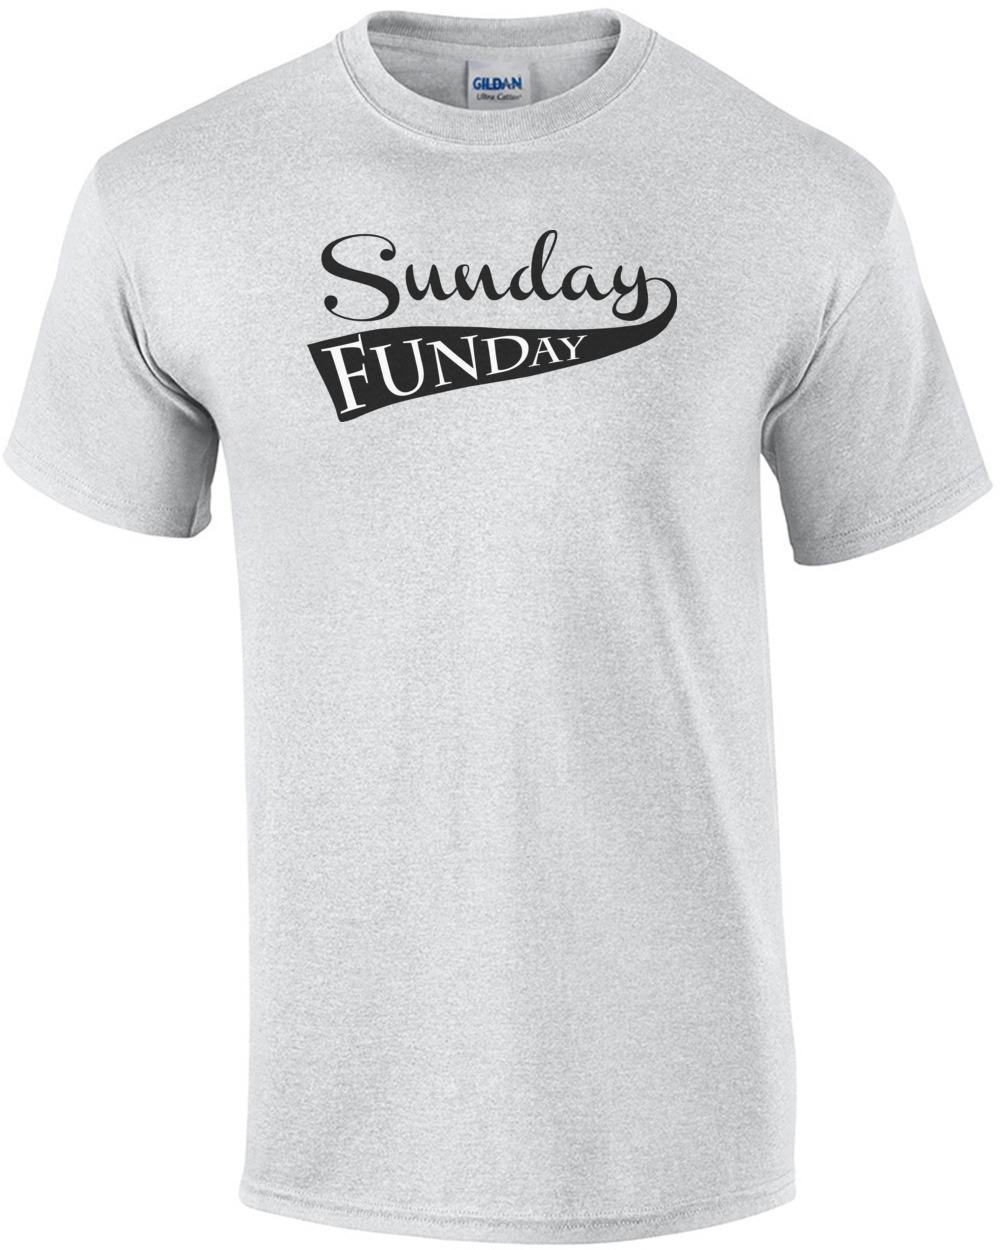 af1576b30 Sunday Funday T-Shirt shirt